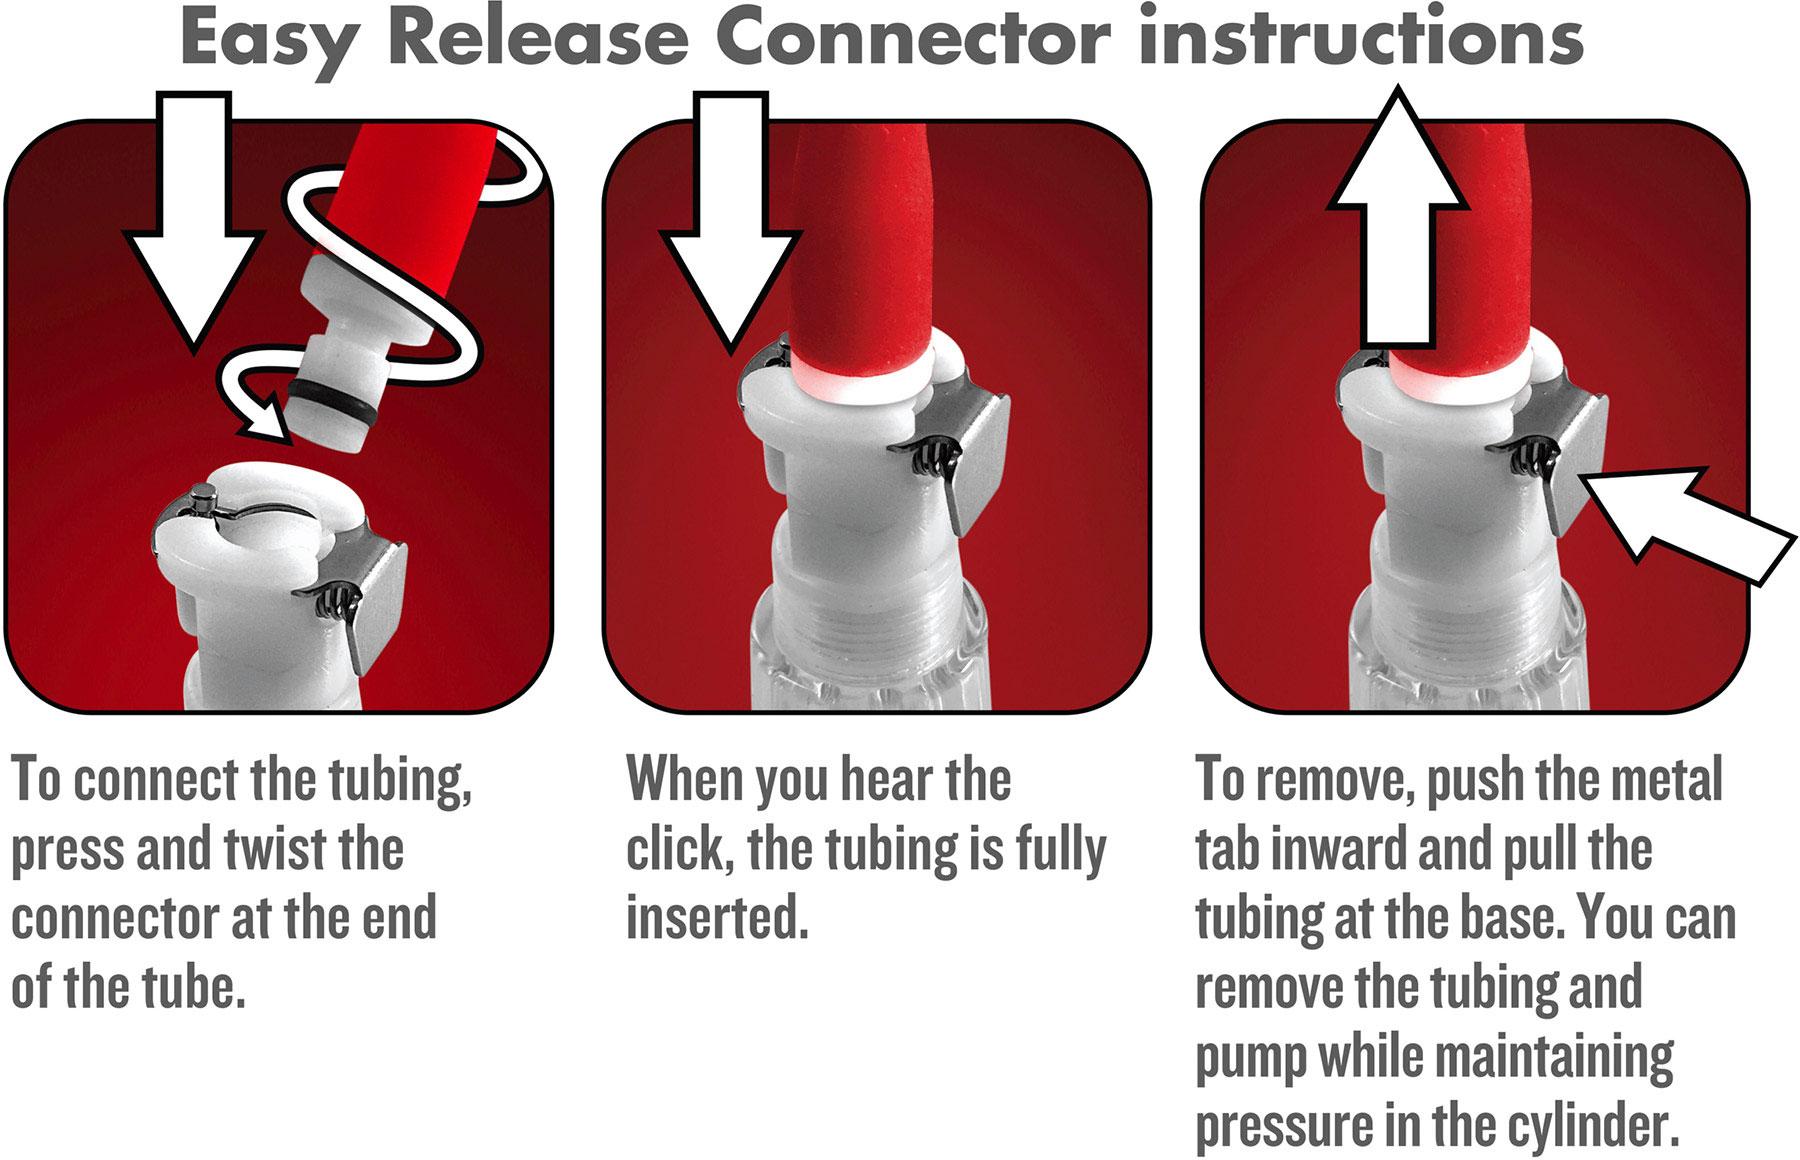 Temptasia Nipple Squeeze Pump System - Directions